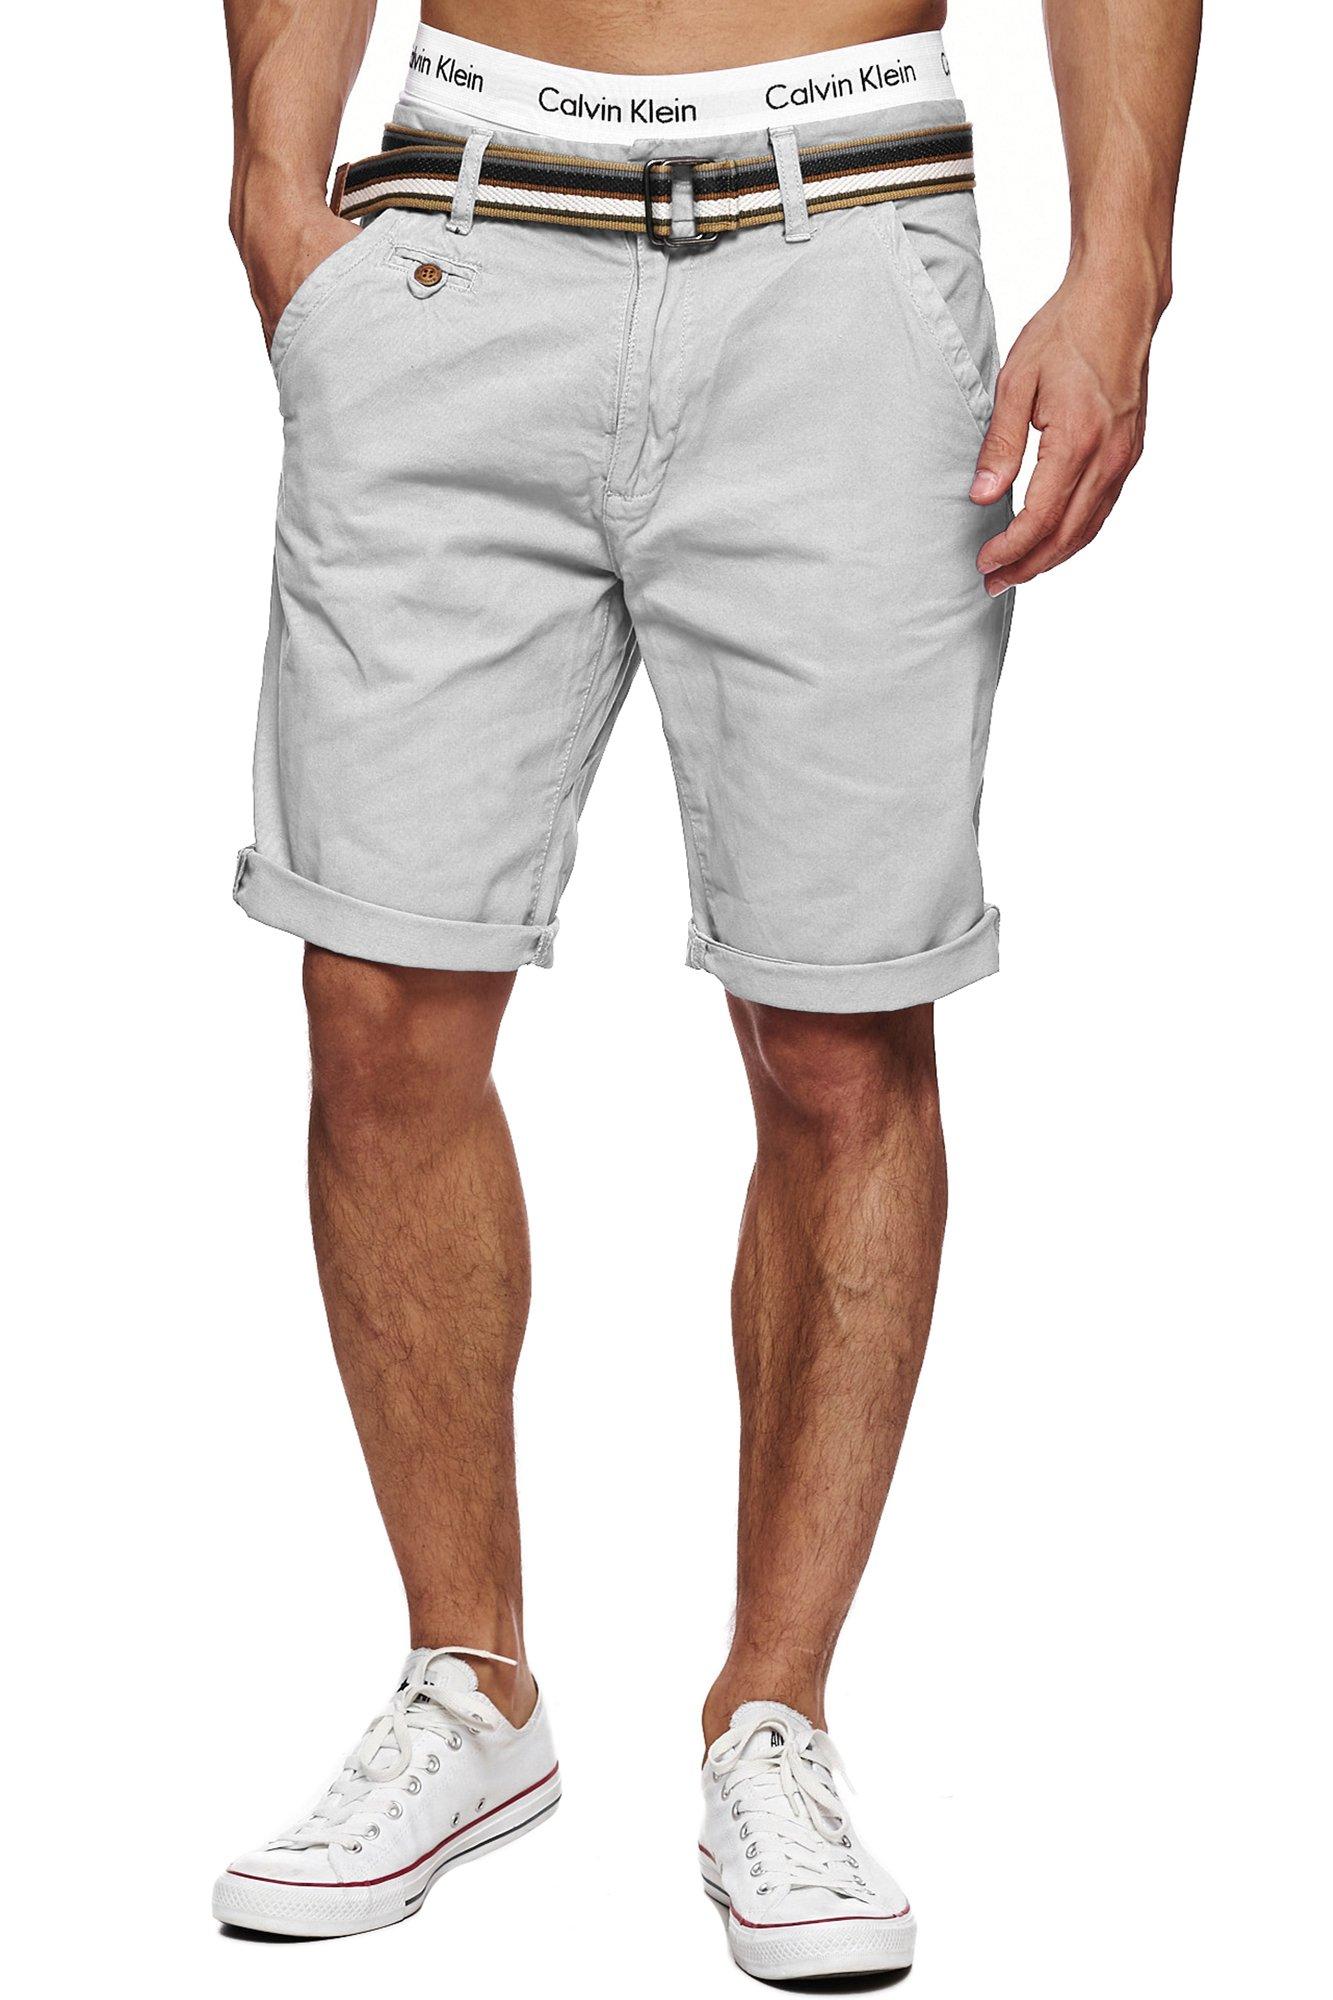 58a5e4b7f0c8 Indicode Herren Cuba Chino-Shorts Kurze Hose mit Gürtel aus 100% Baumwolle  Light Grey